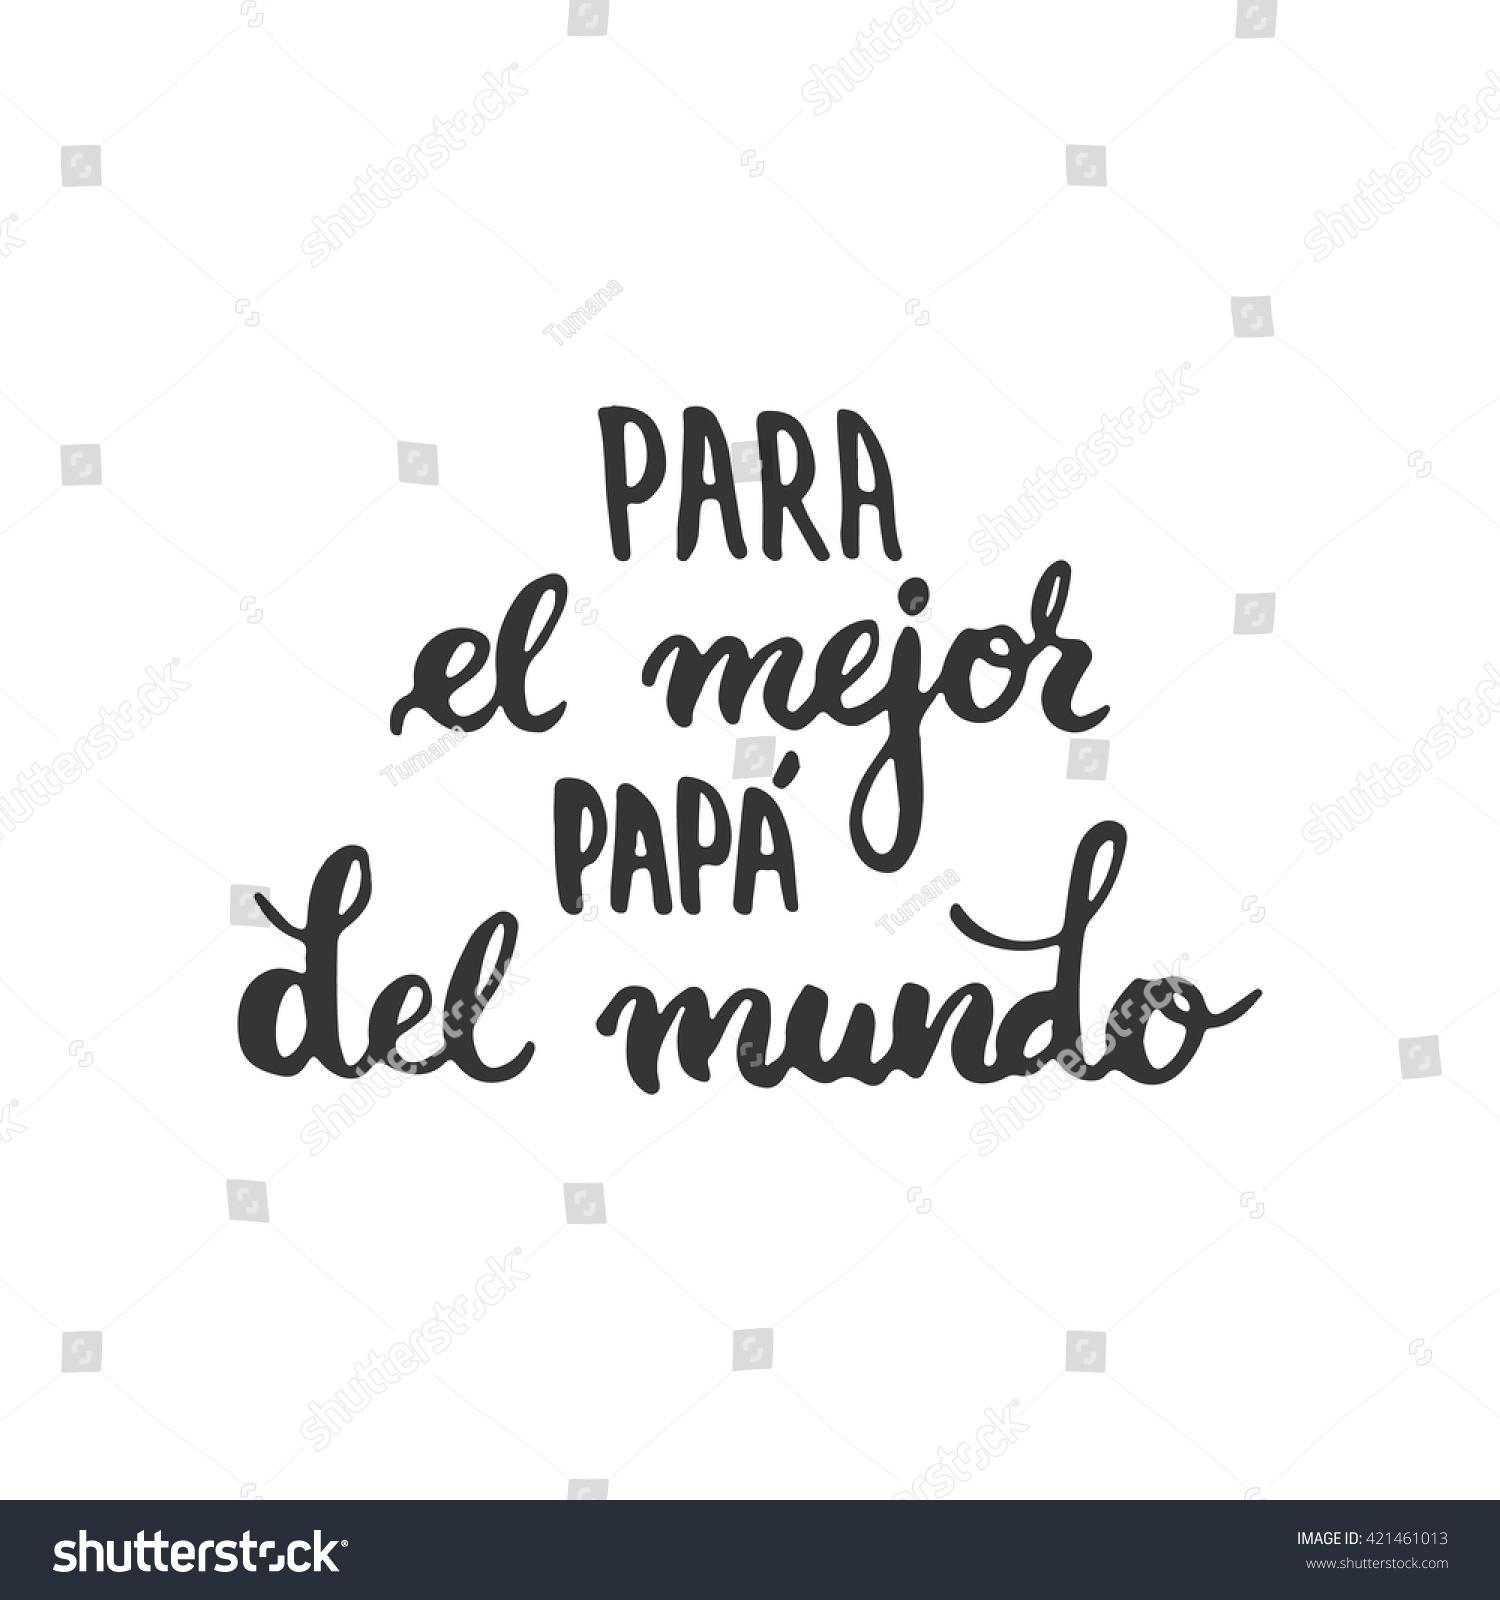 Fathers day lettering calligraphy phrase spanish stock - El mejor colchon del mundo ...